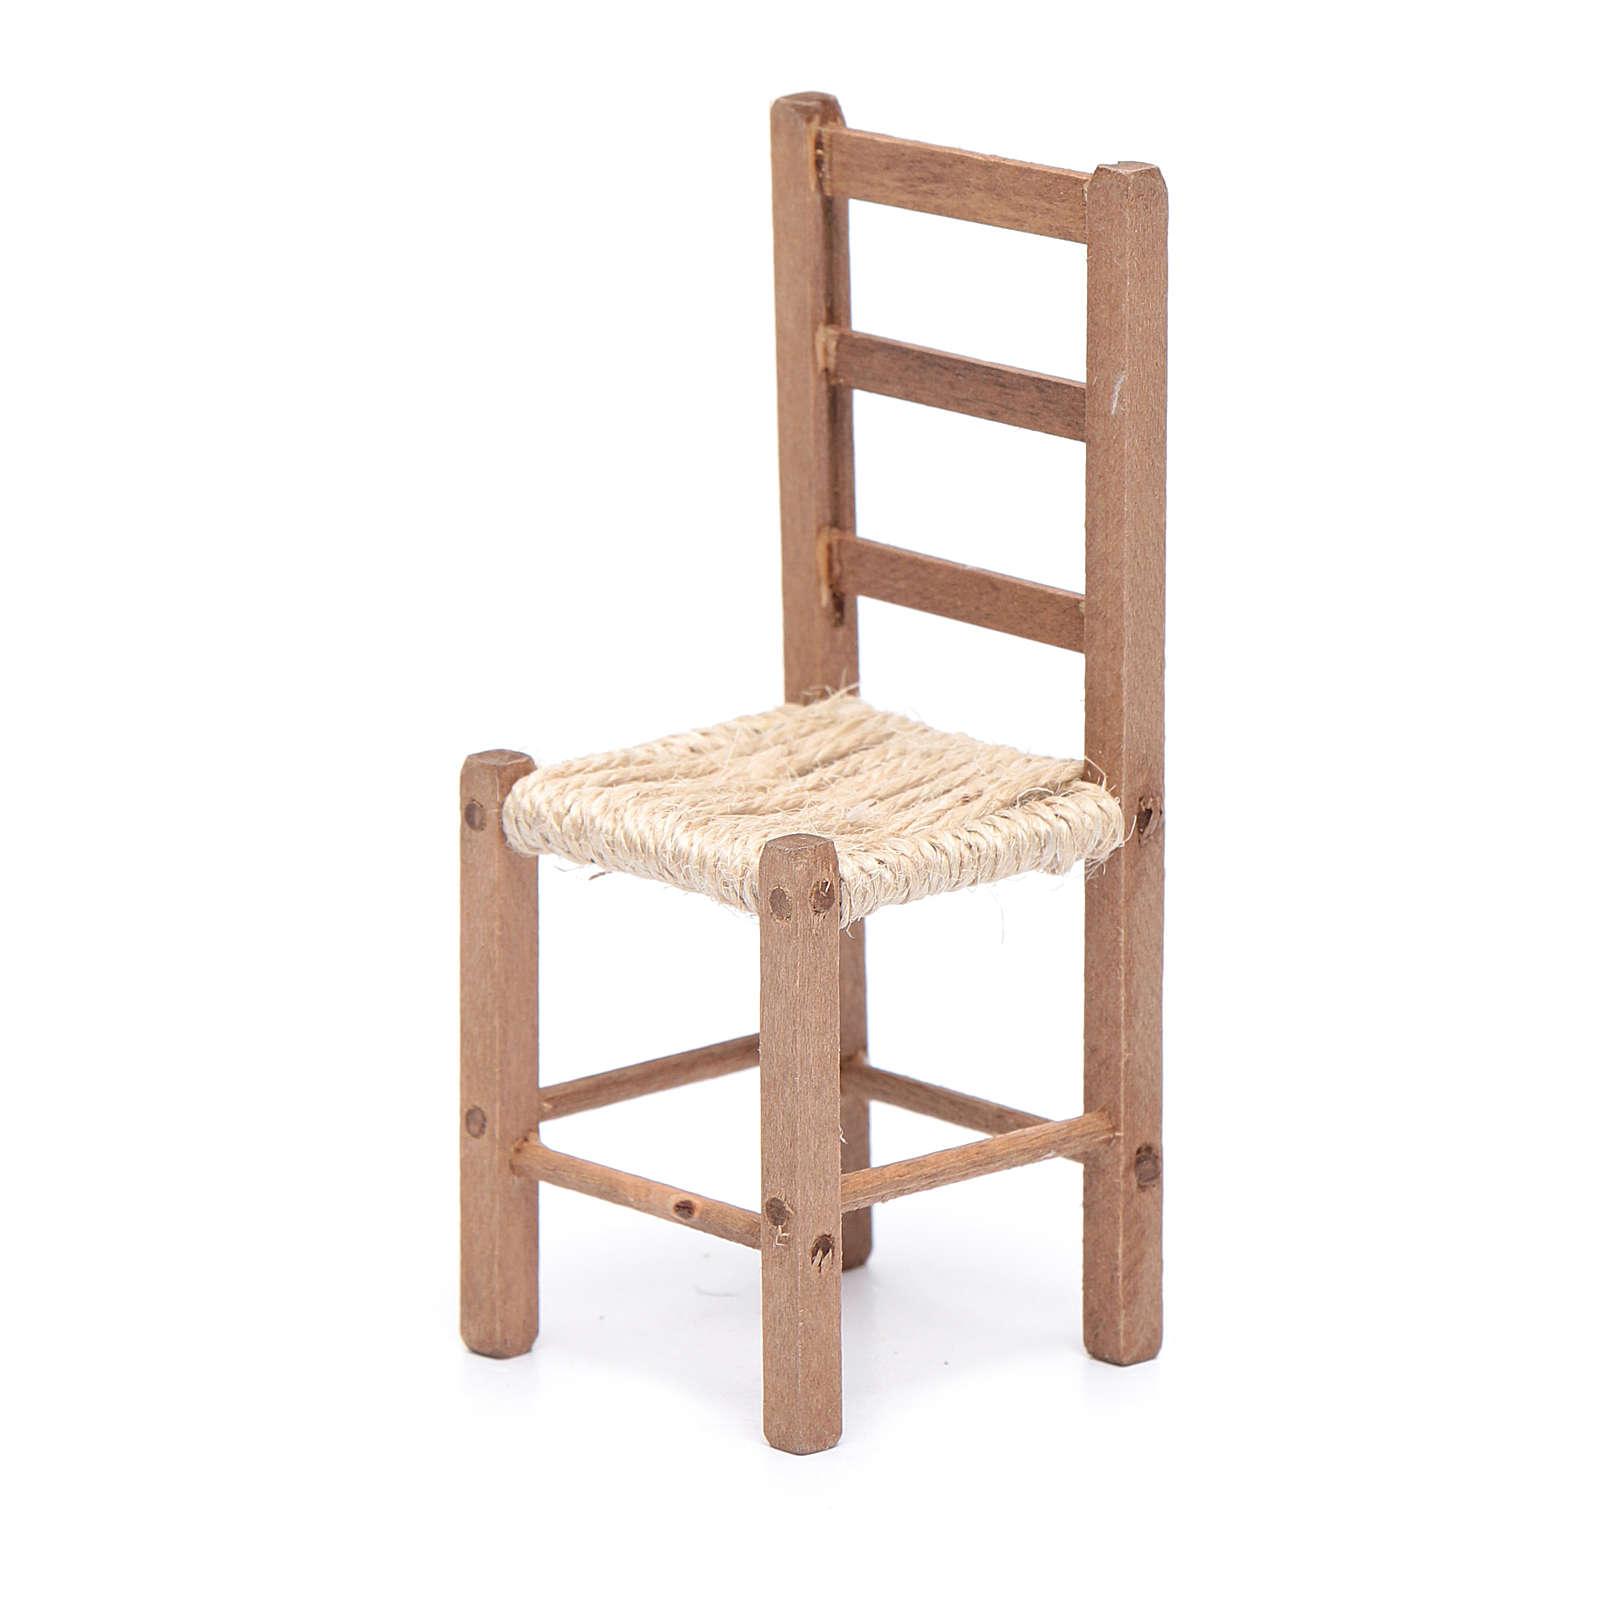 Sedia 11 cm in legno e corda presepe napoletano 4